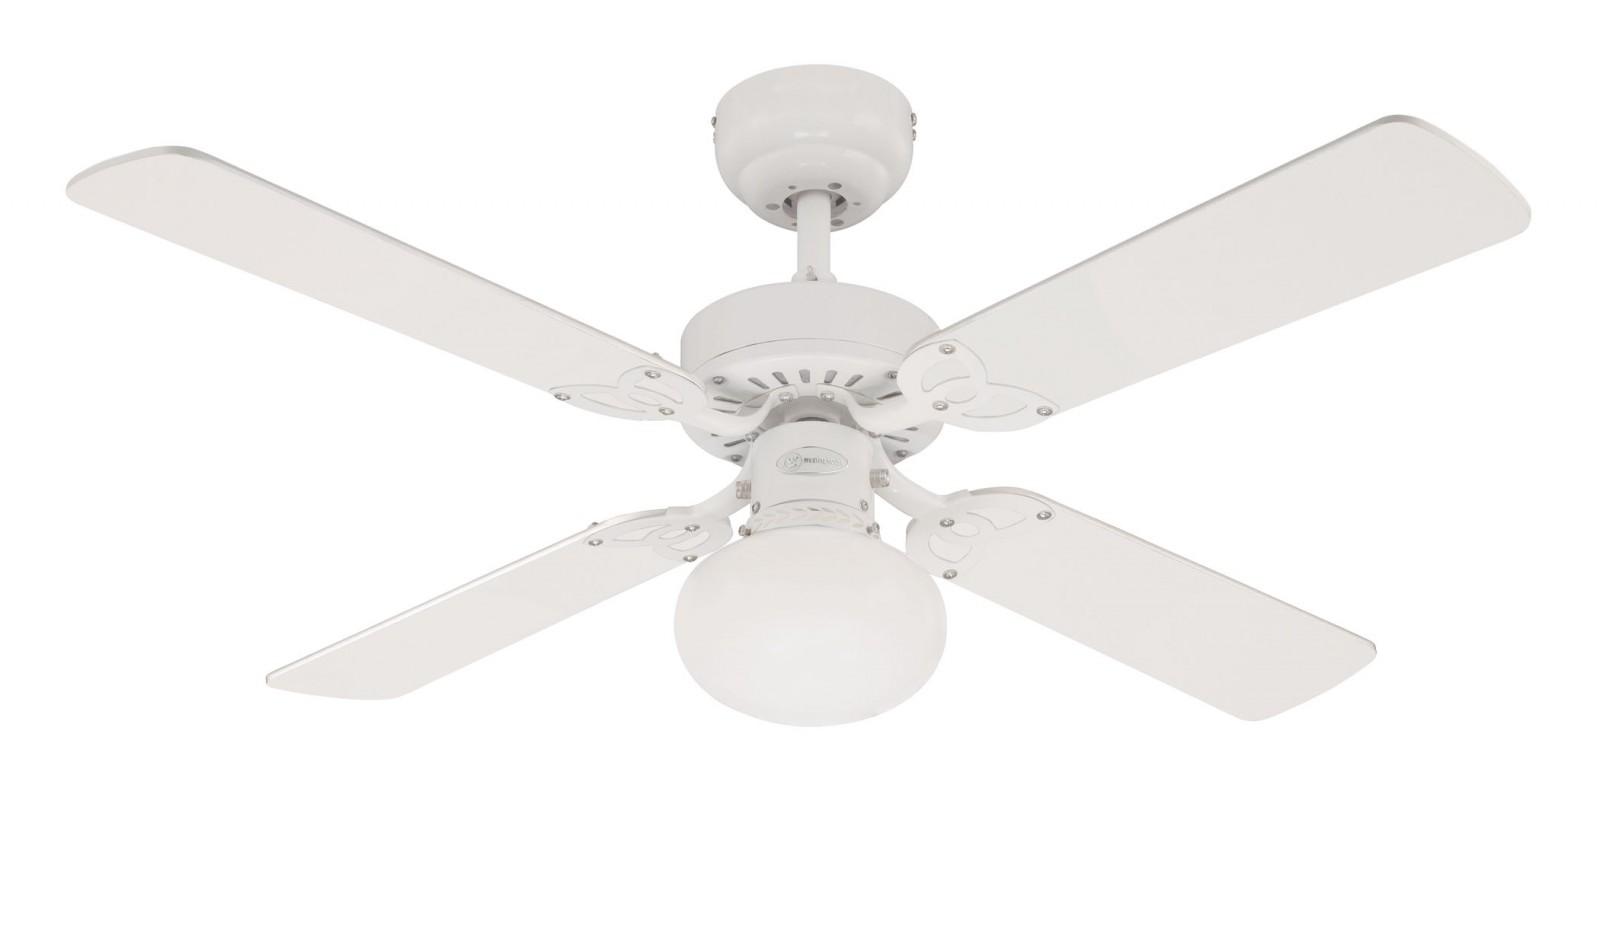 Westinghouse Elegant Classic Ceiling Fan Vegas white 105